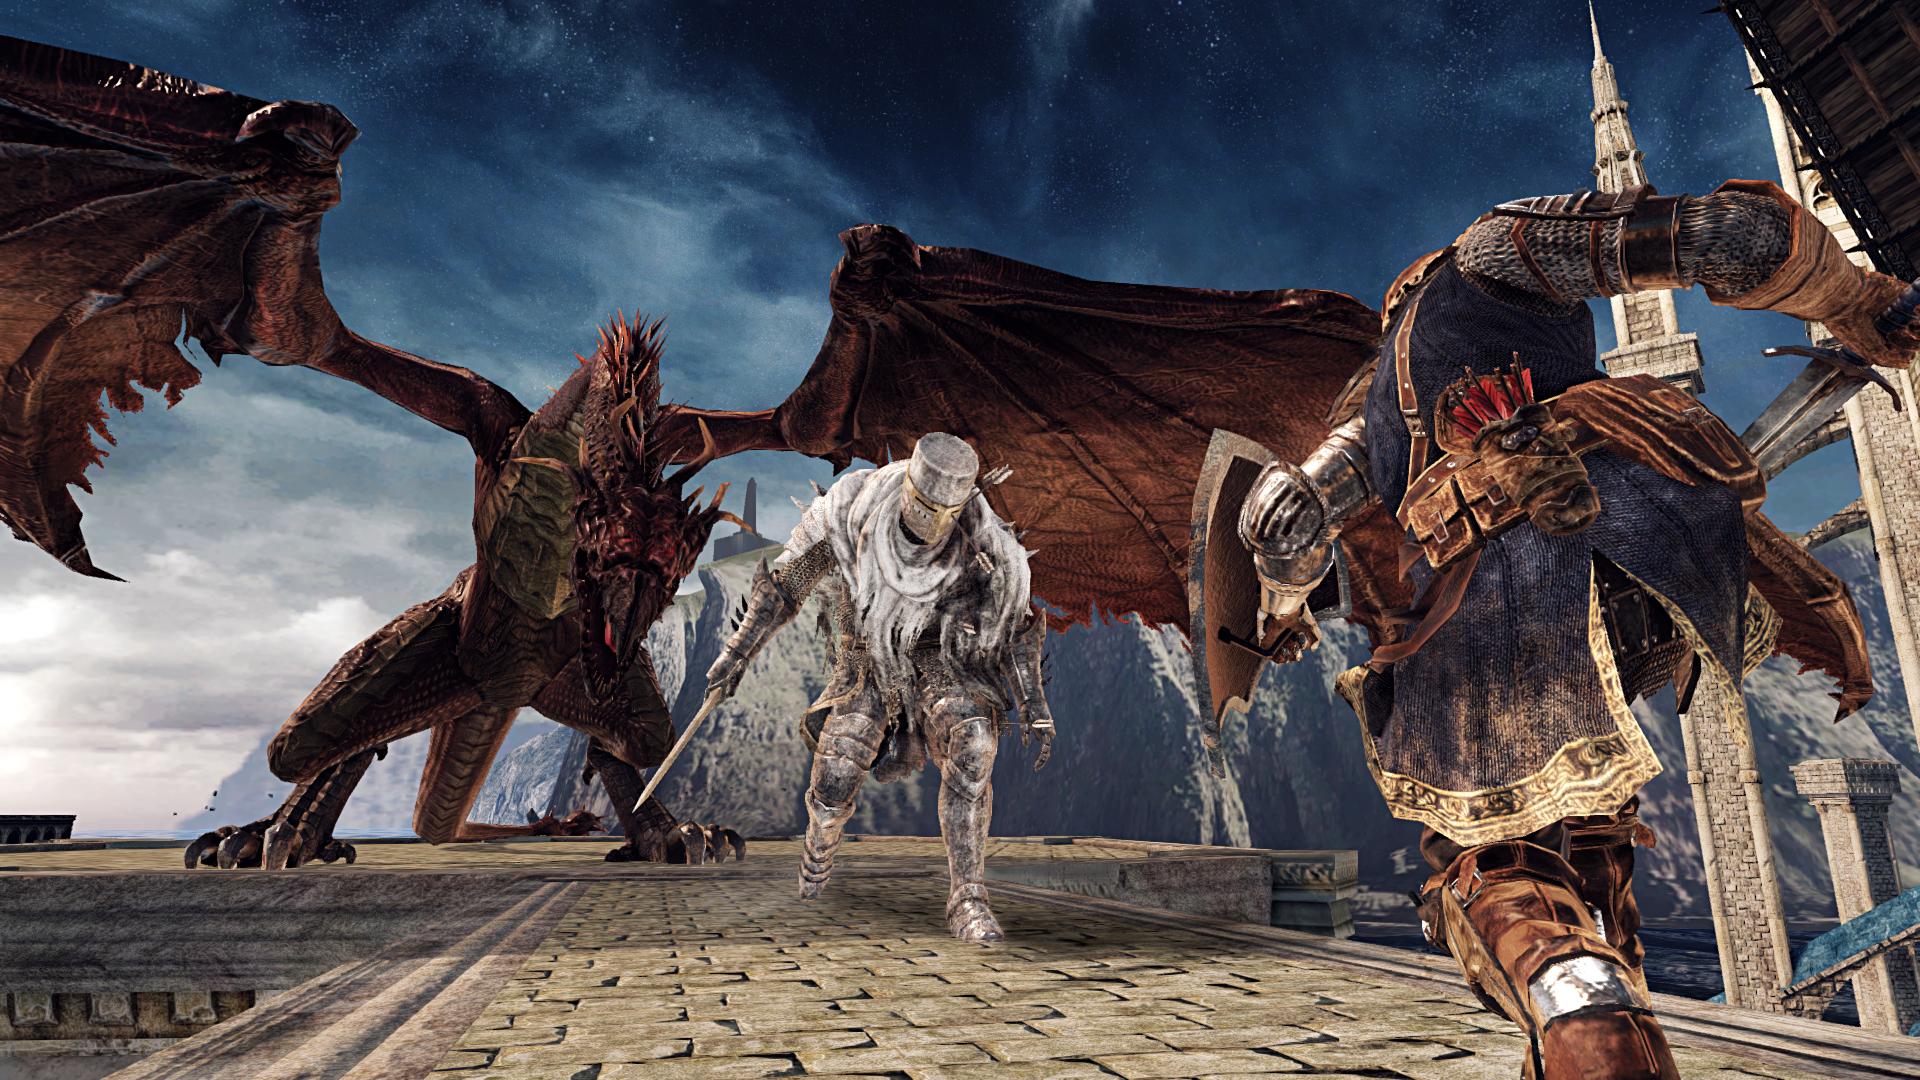 Obrazem: Temné dungeony, kostlivci a monstra z Dark Souls 2: Scholar of the First Sin 107572